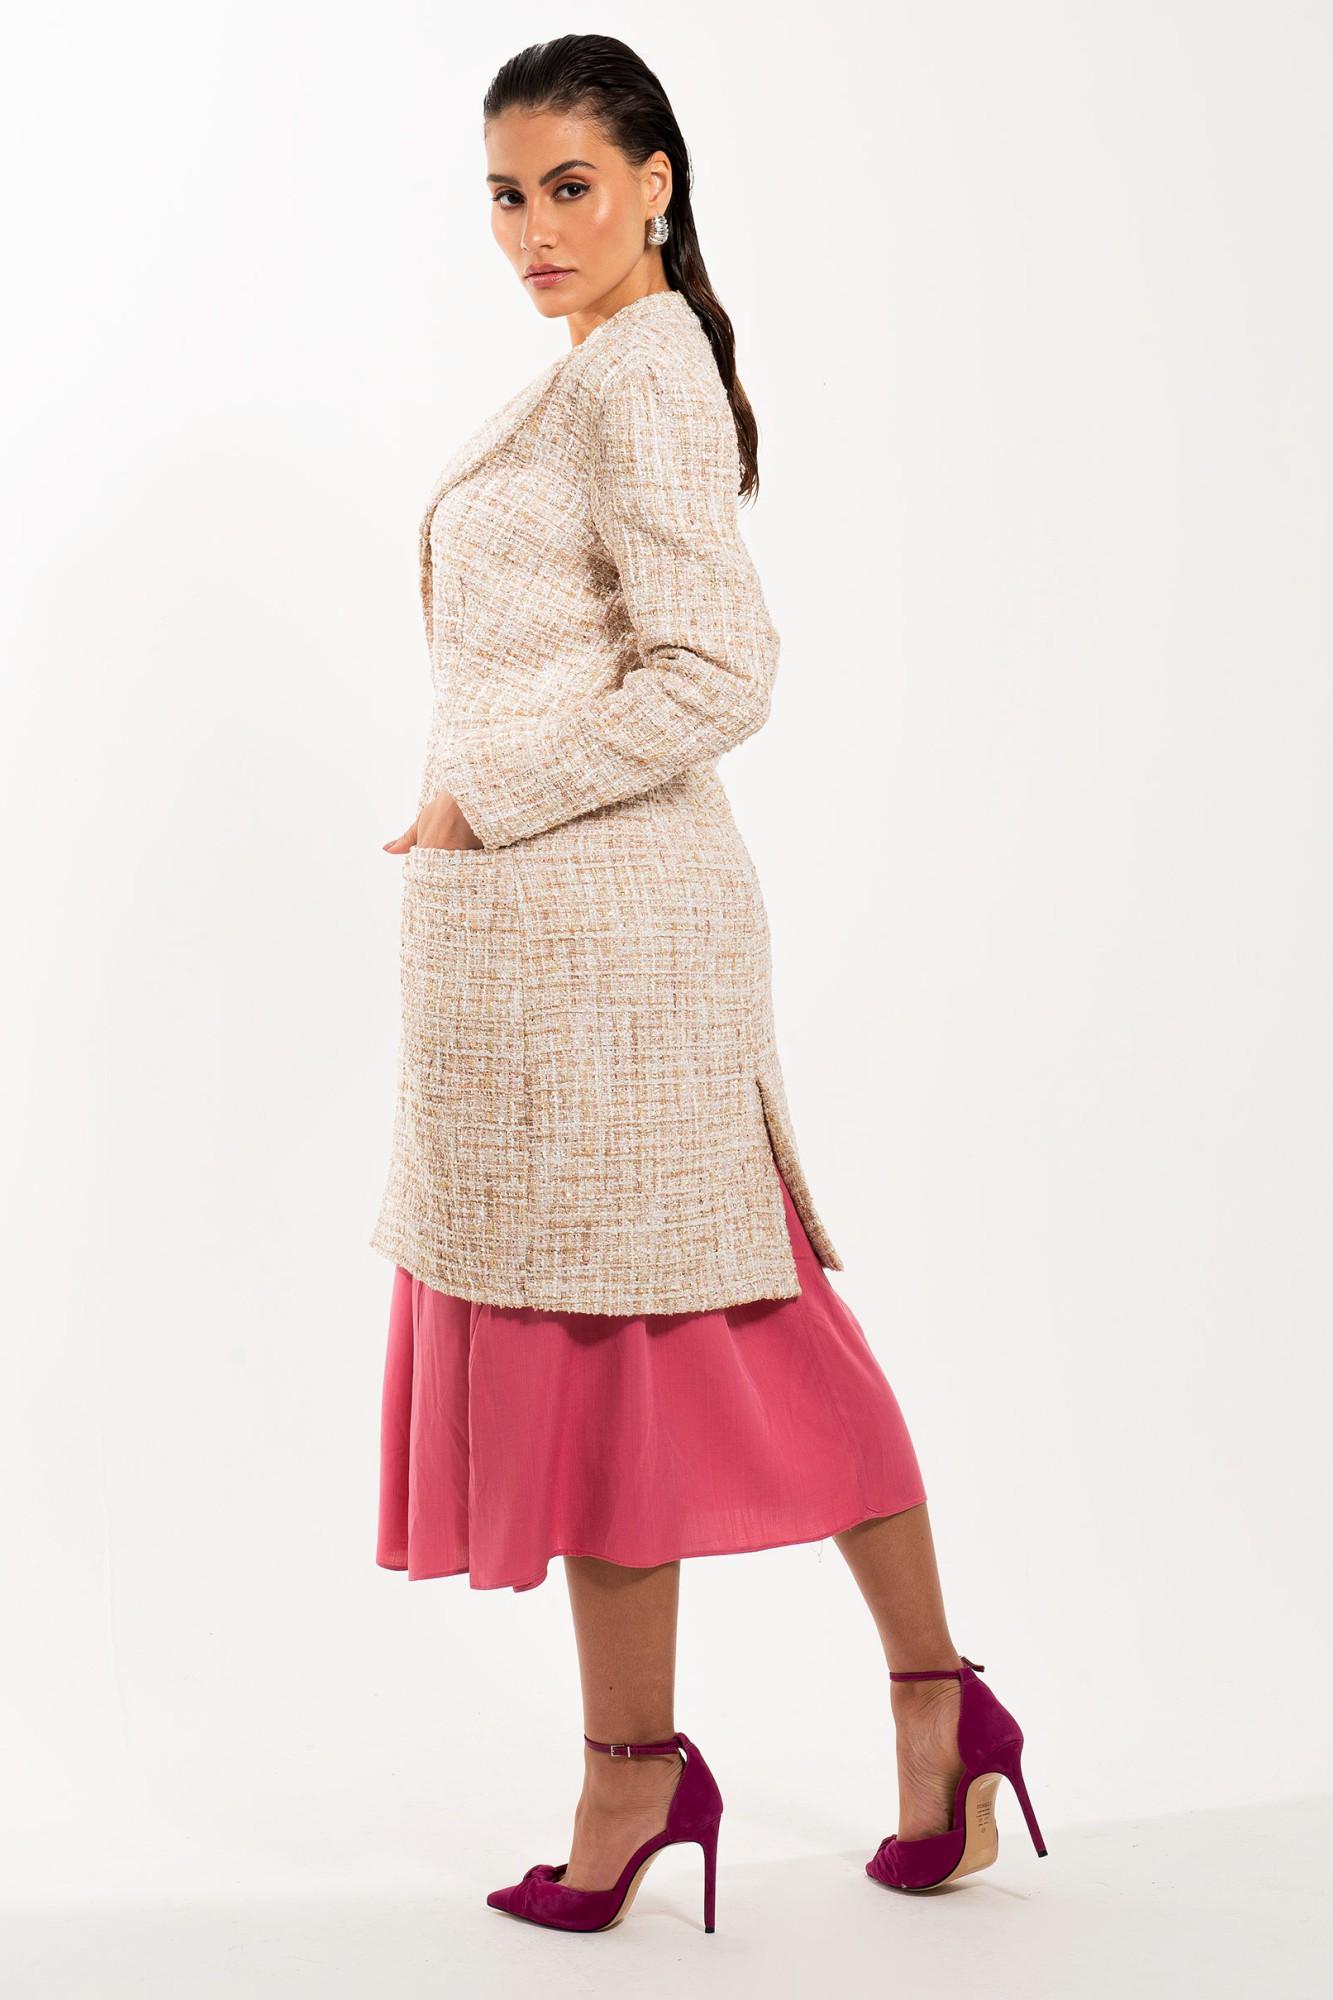 Jaleco Feminino de Inverno Trench Coat Alba